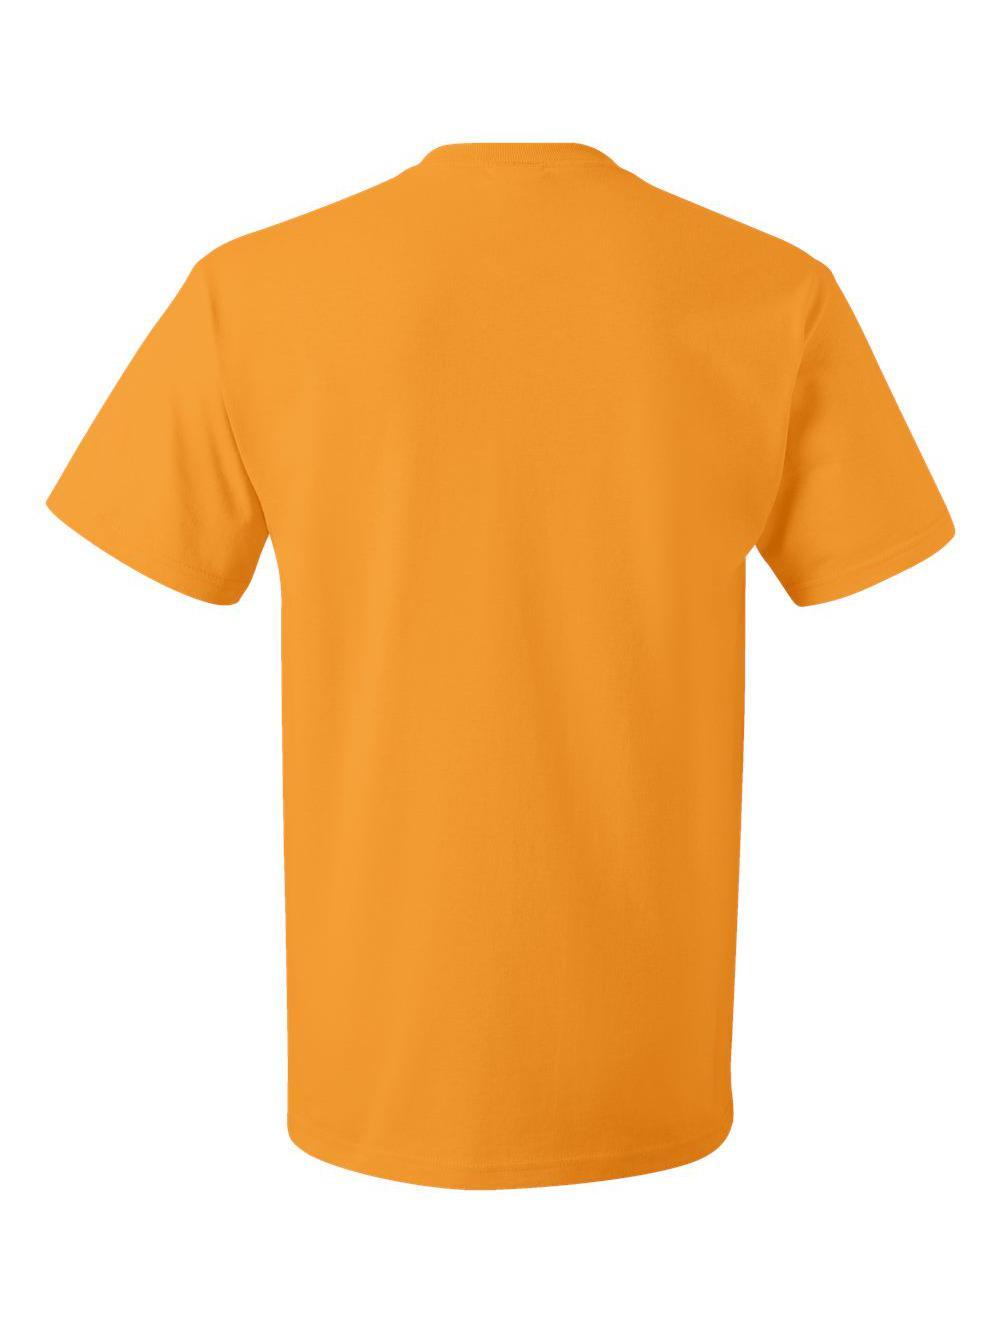 Fruit-of-the-Loom-HD-Cotton-Short-Sleeve-T-Shirt-3930R thumbnail 121